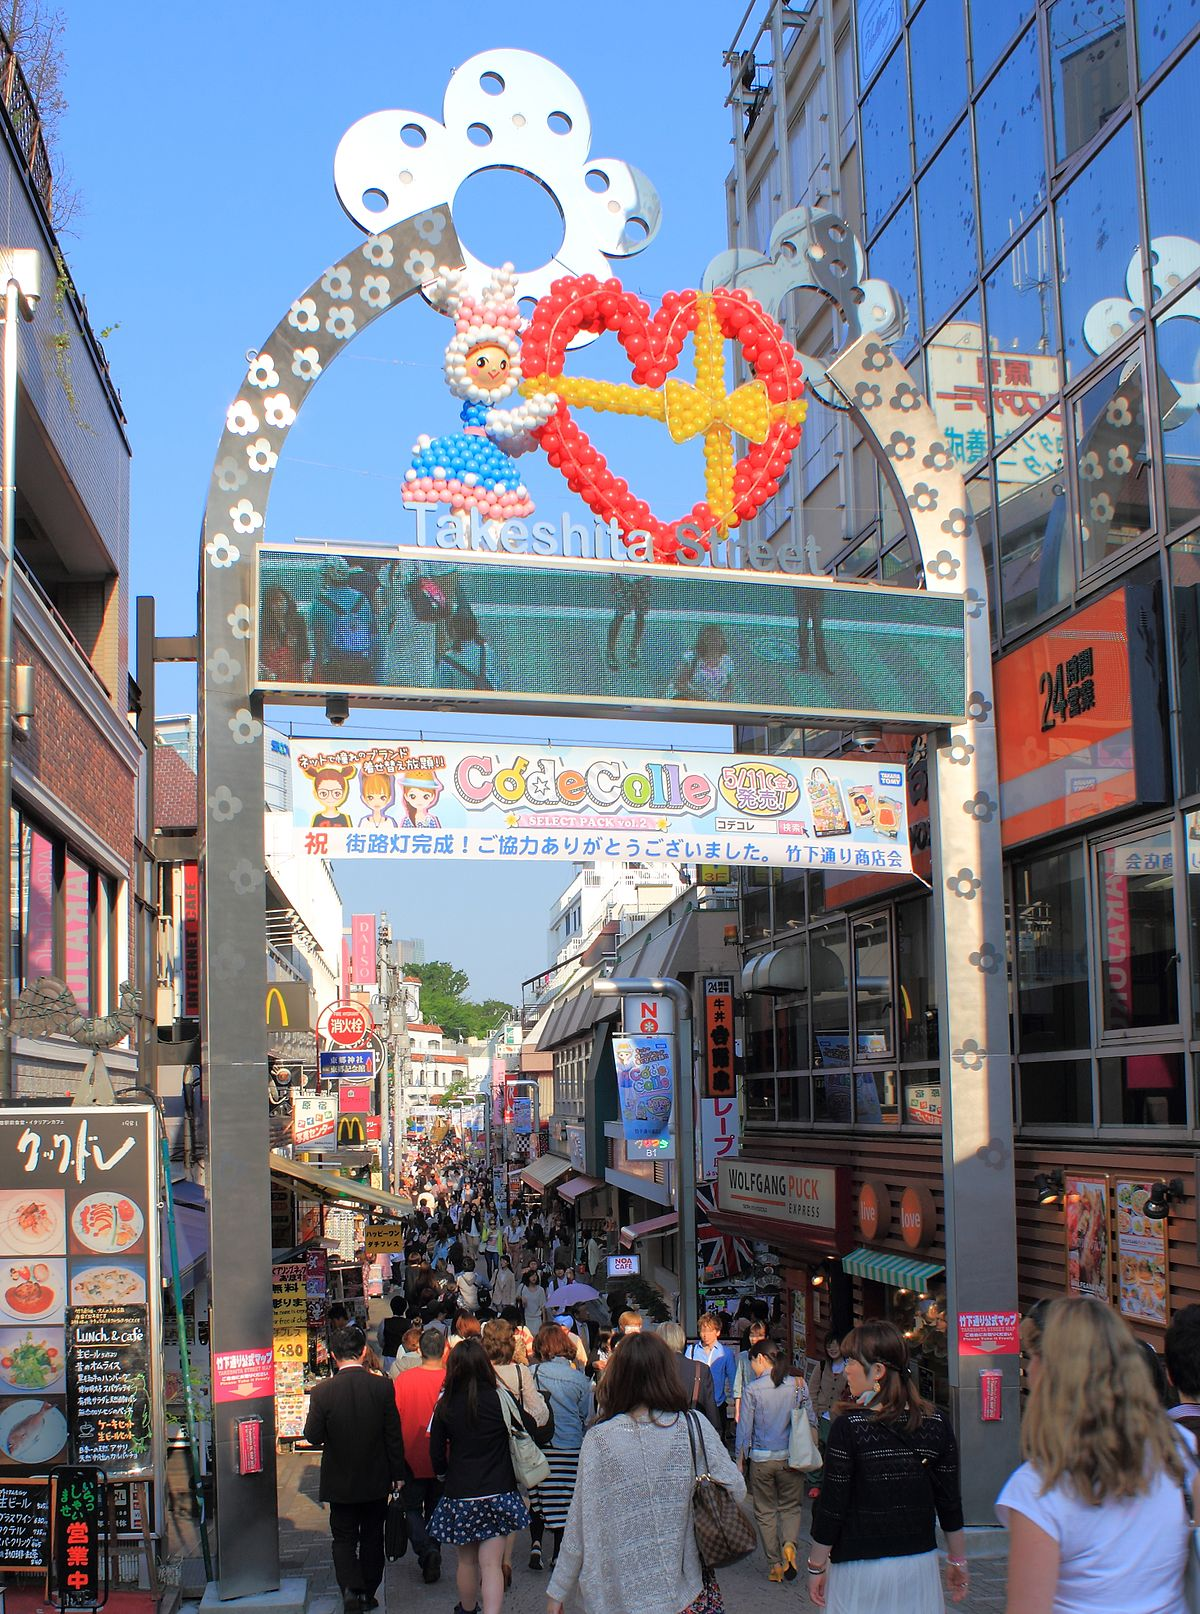 7 eleven_Takeshita Street - Wikipedia